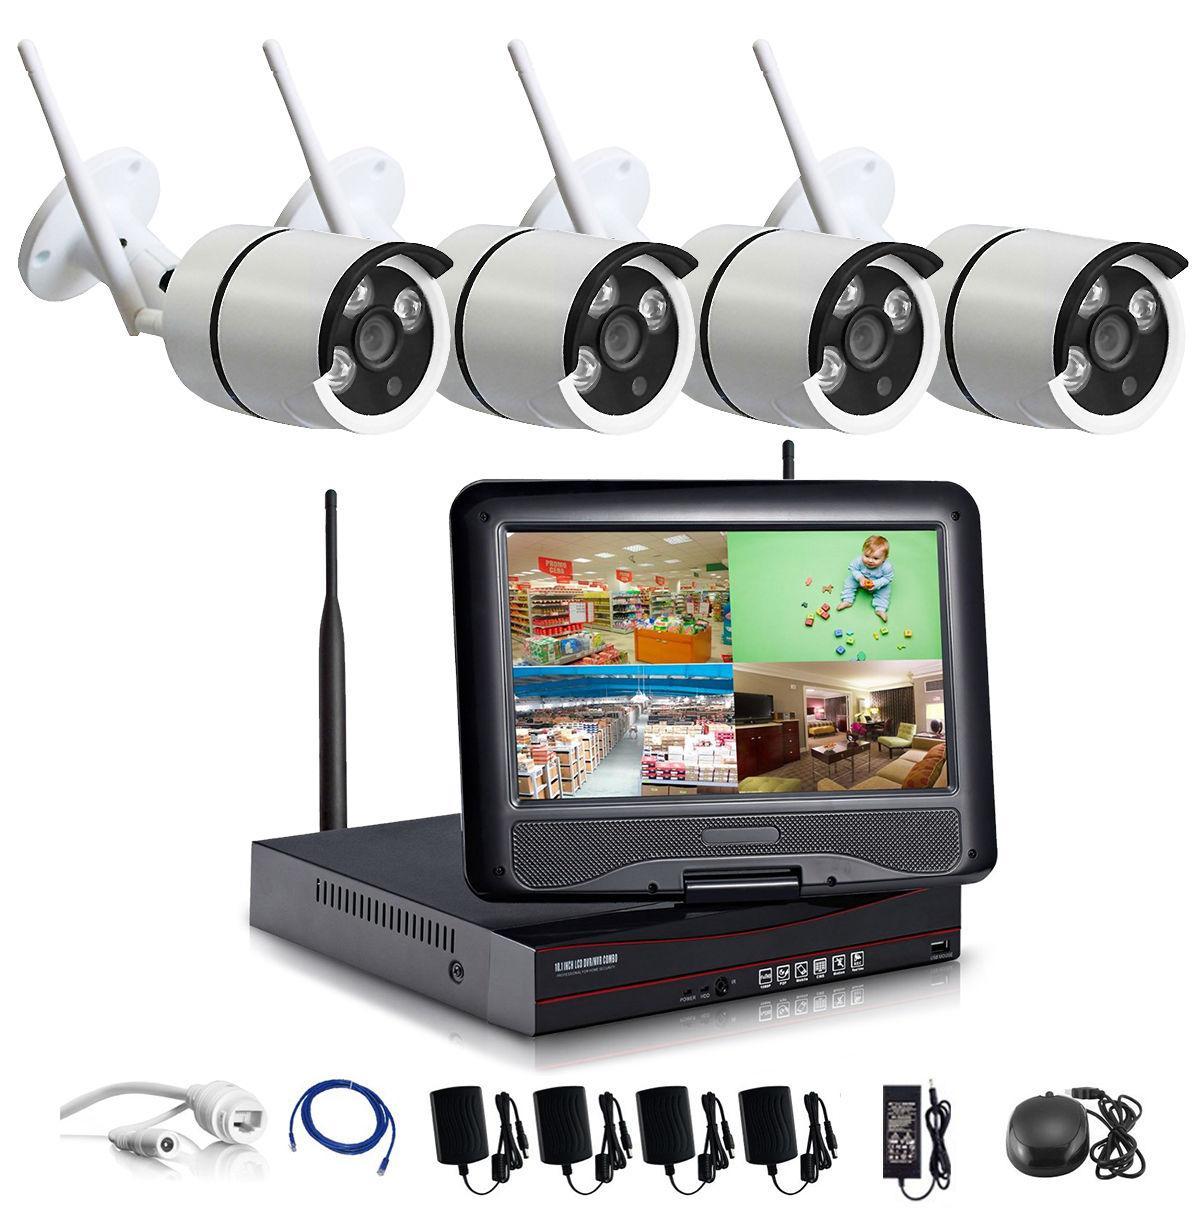 1280 * 720P HD شبكة لاسلكية في الهواء الطلق / IP الأمن كاميرا 4CH 720P HD واي فاي NVR اللاسلكي الدوائر التلفزيونية المغلقة وأنظمة المراقبة أمن الوطن